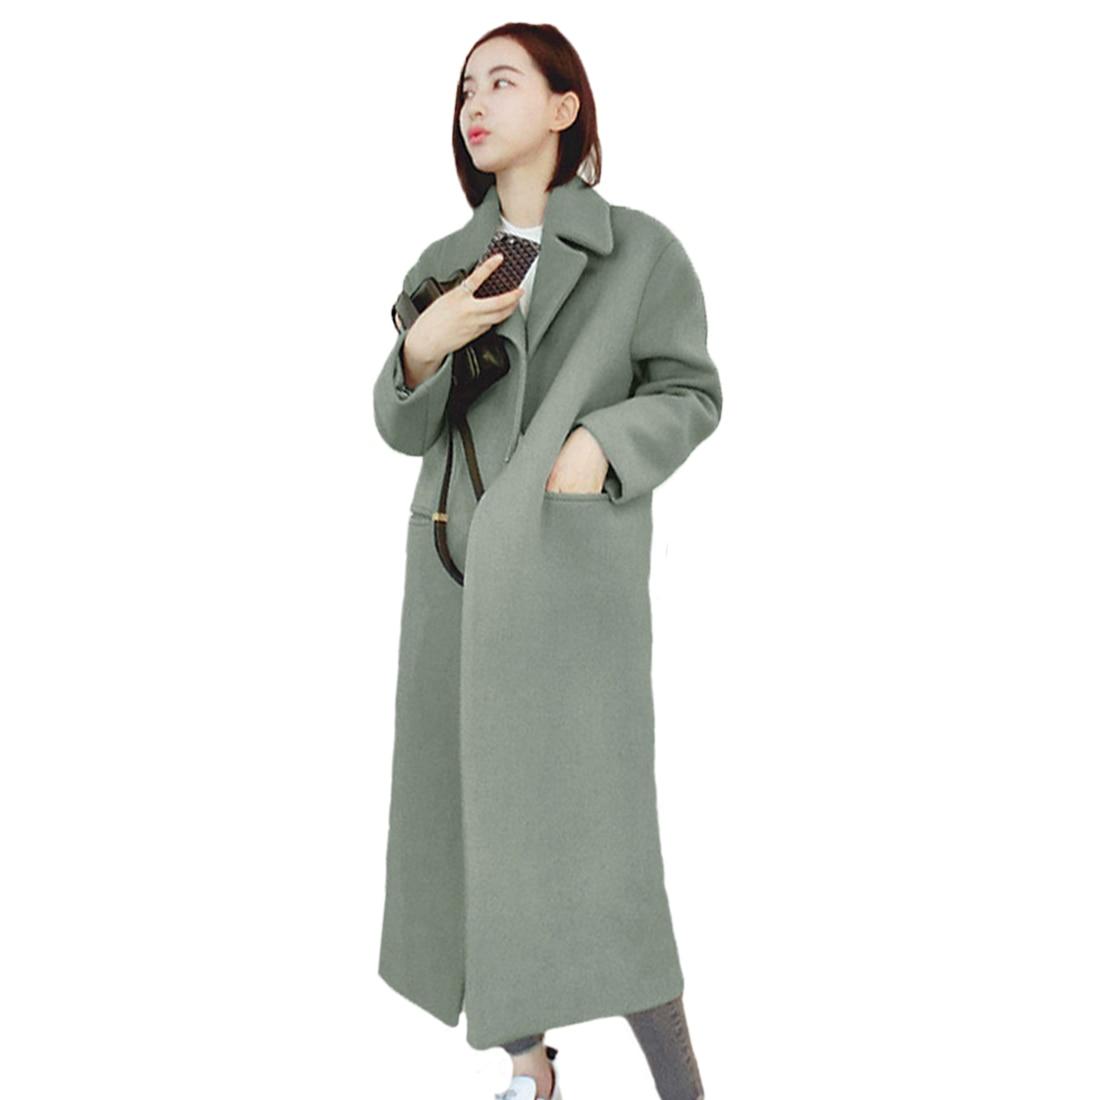 Elegant Women Winter Lapel Wool Cashmere Jacket Coat   Trench   Long Parka Overcoat